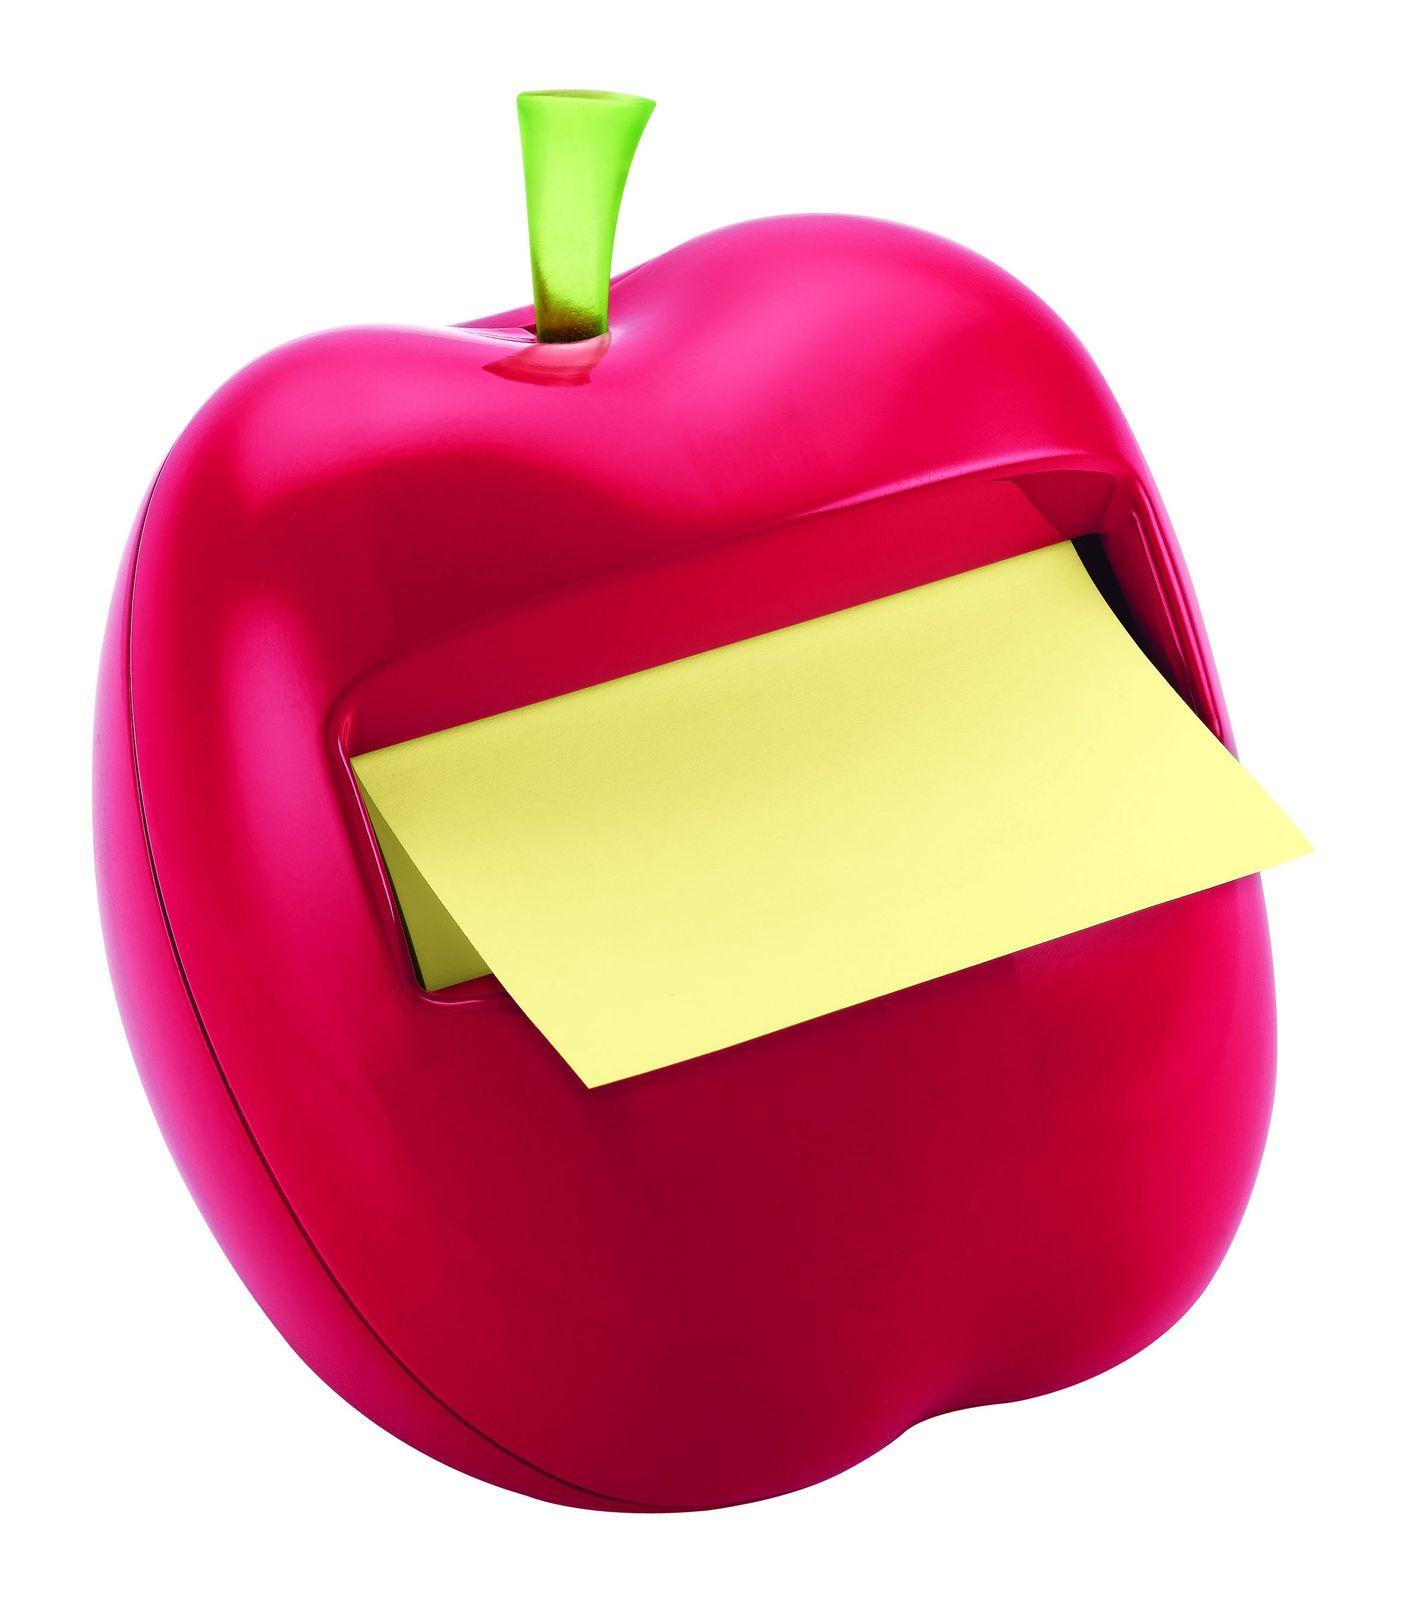 Post-it Pop-Up Dispenser - Apple image